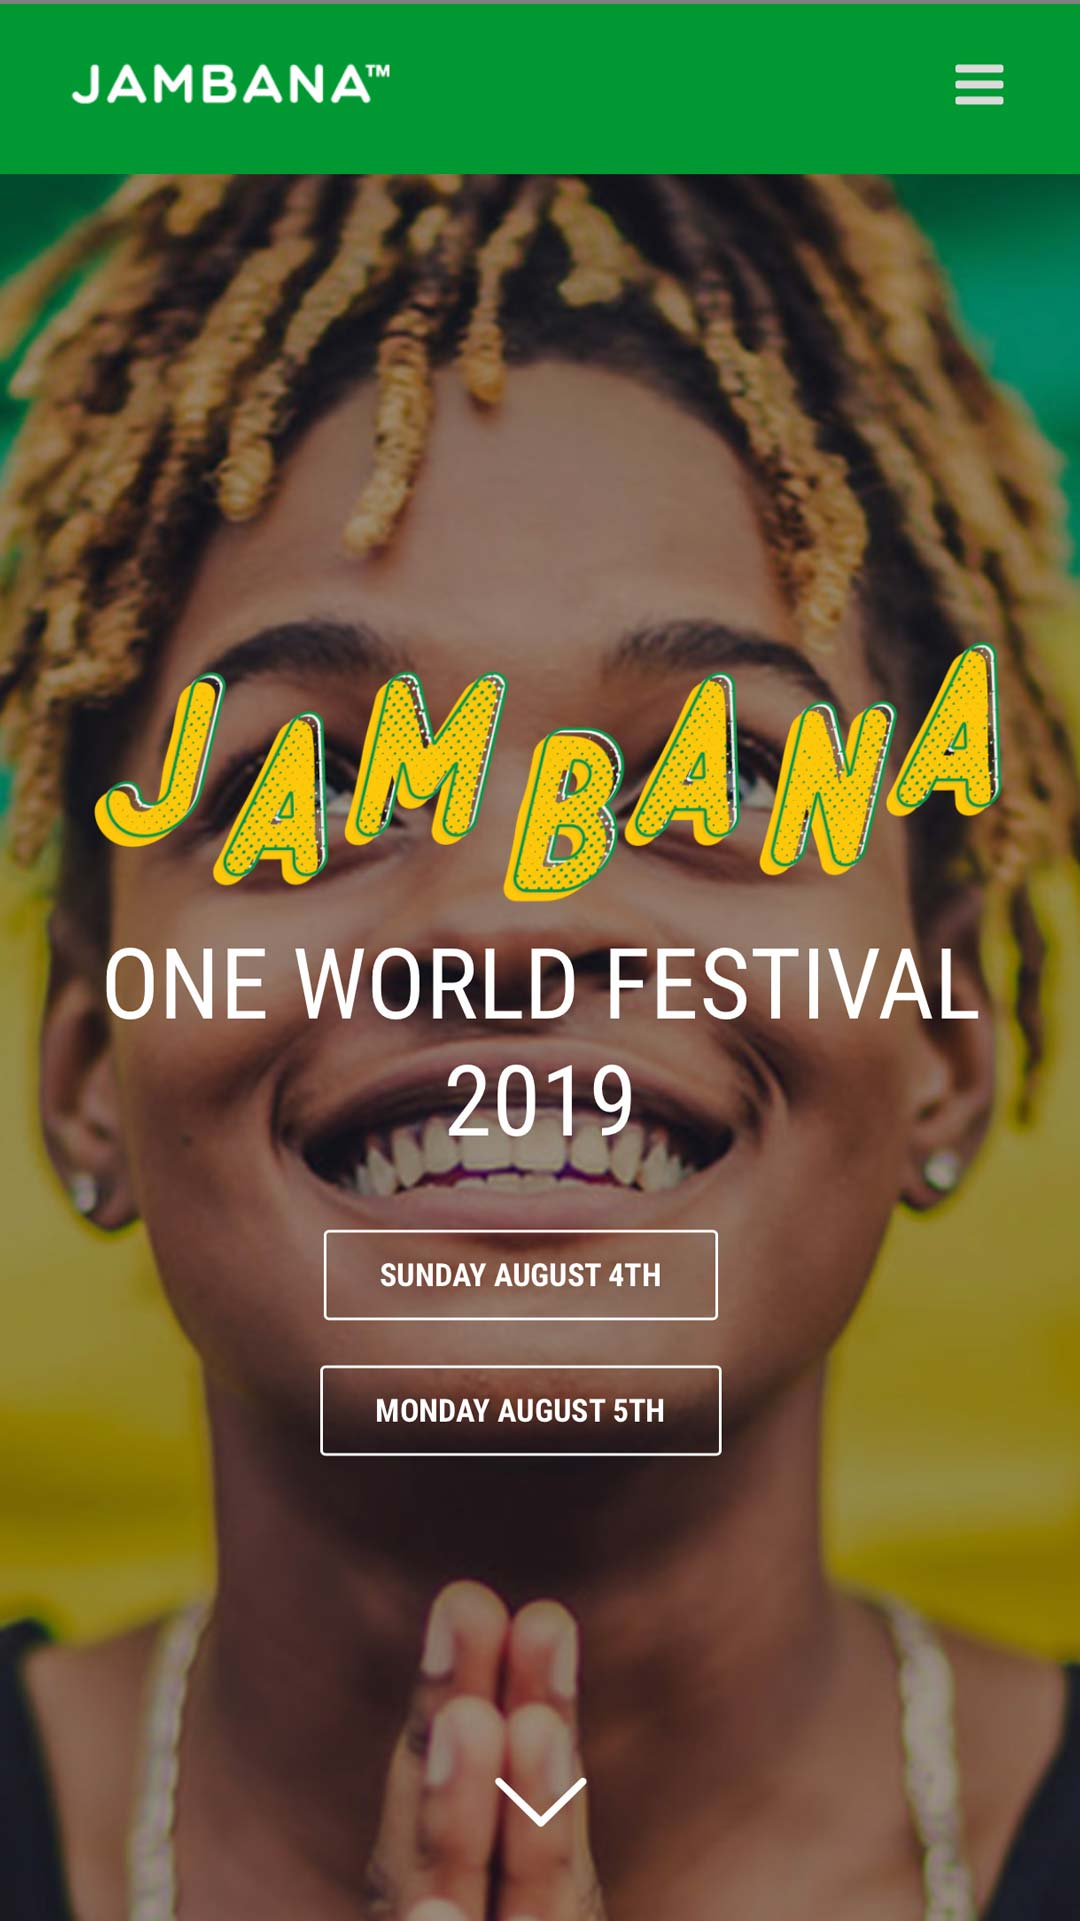 Toronto Website Design Jambana